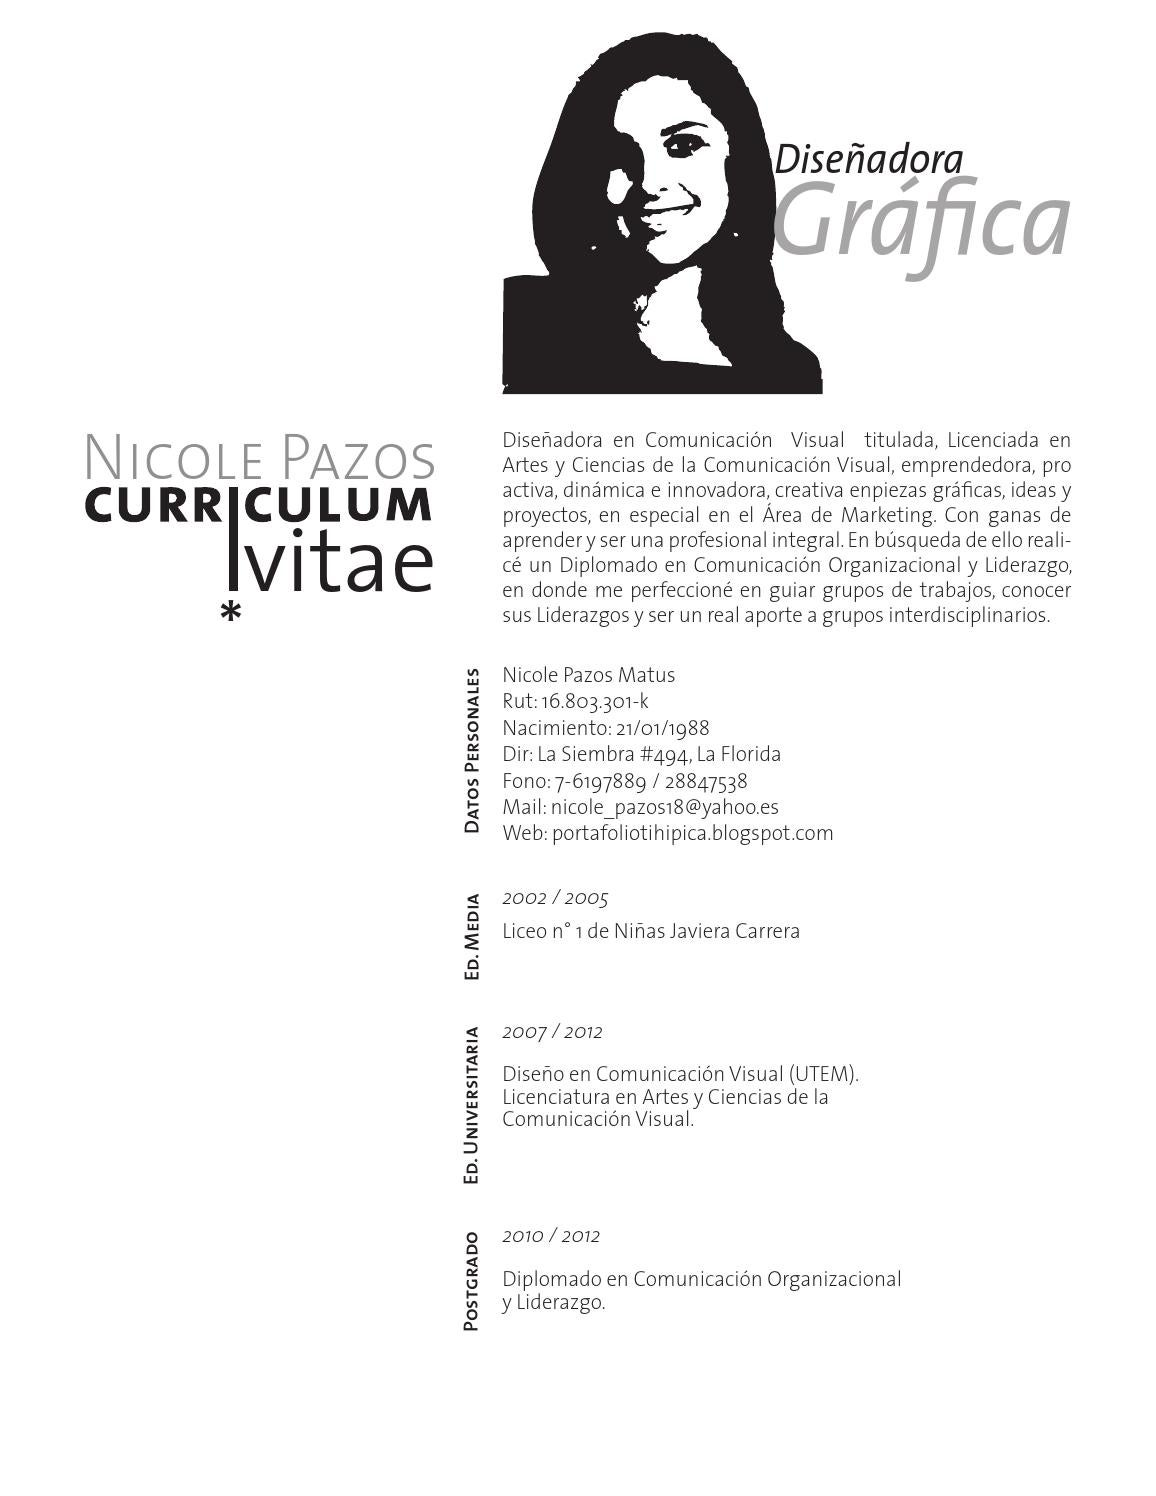 Curriculum nicole pazos by nicole pazos - issuu